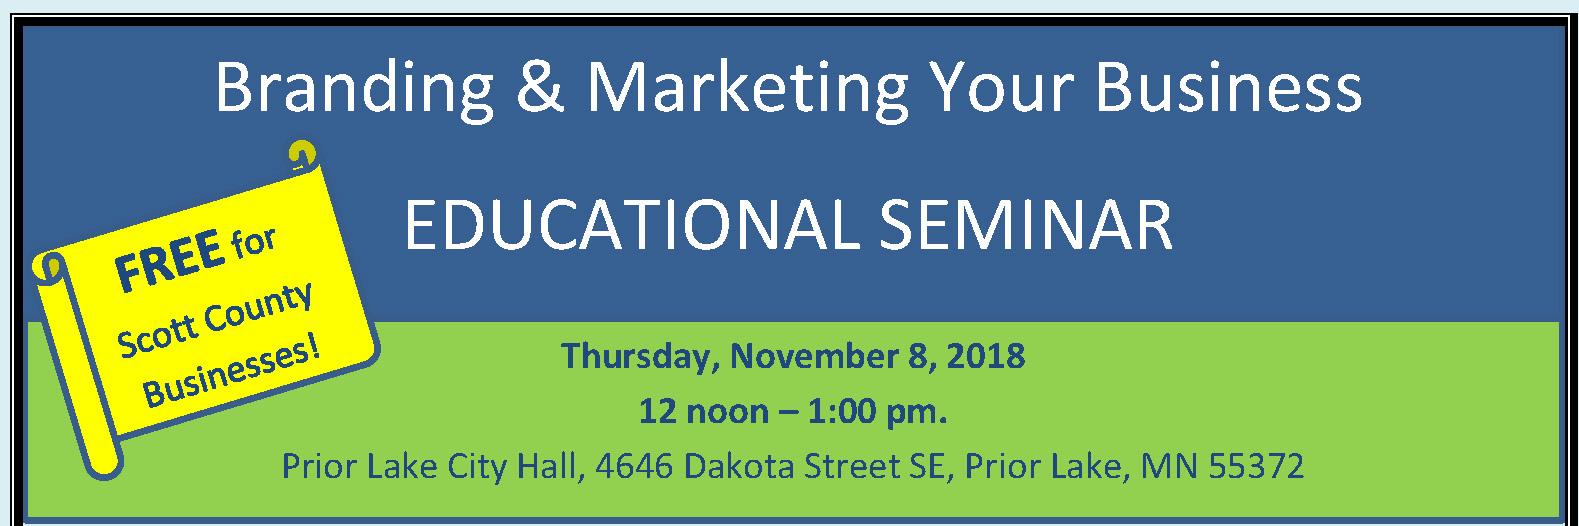 Branding & Marketing Your Business EDUCATIONAL SEMINAR